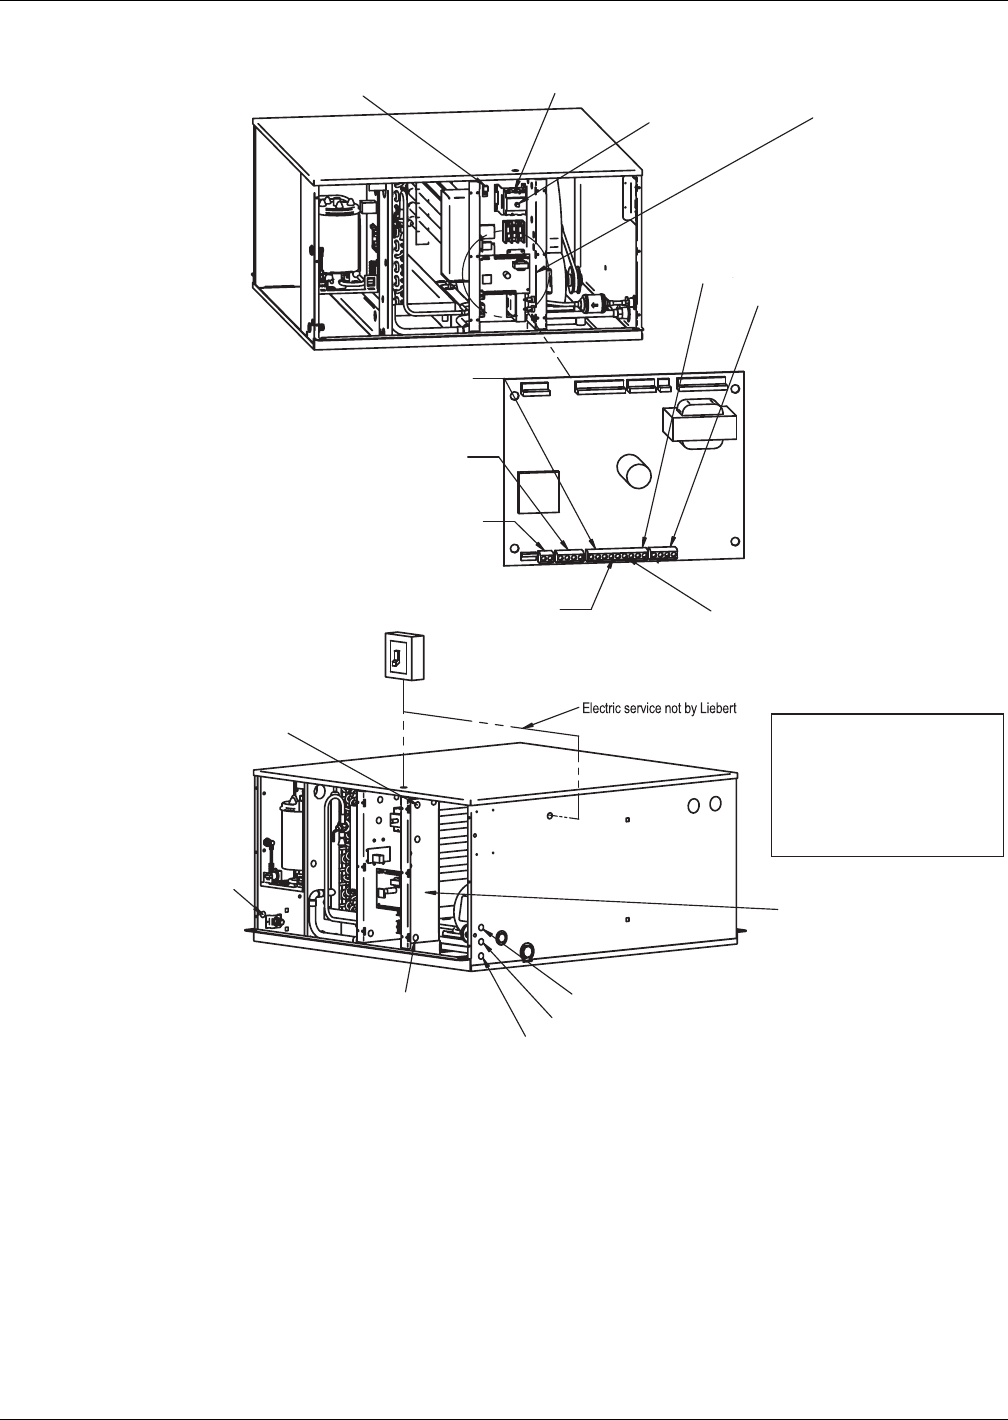 Emerson MINI-MATE2 Figure 14 Evaporator unit electrical